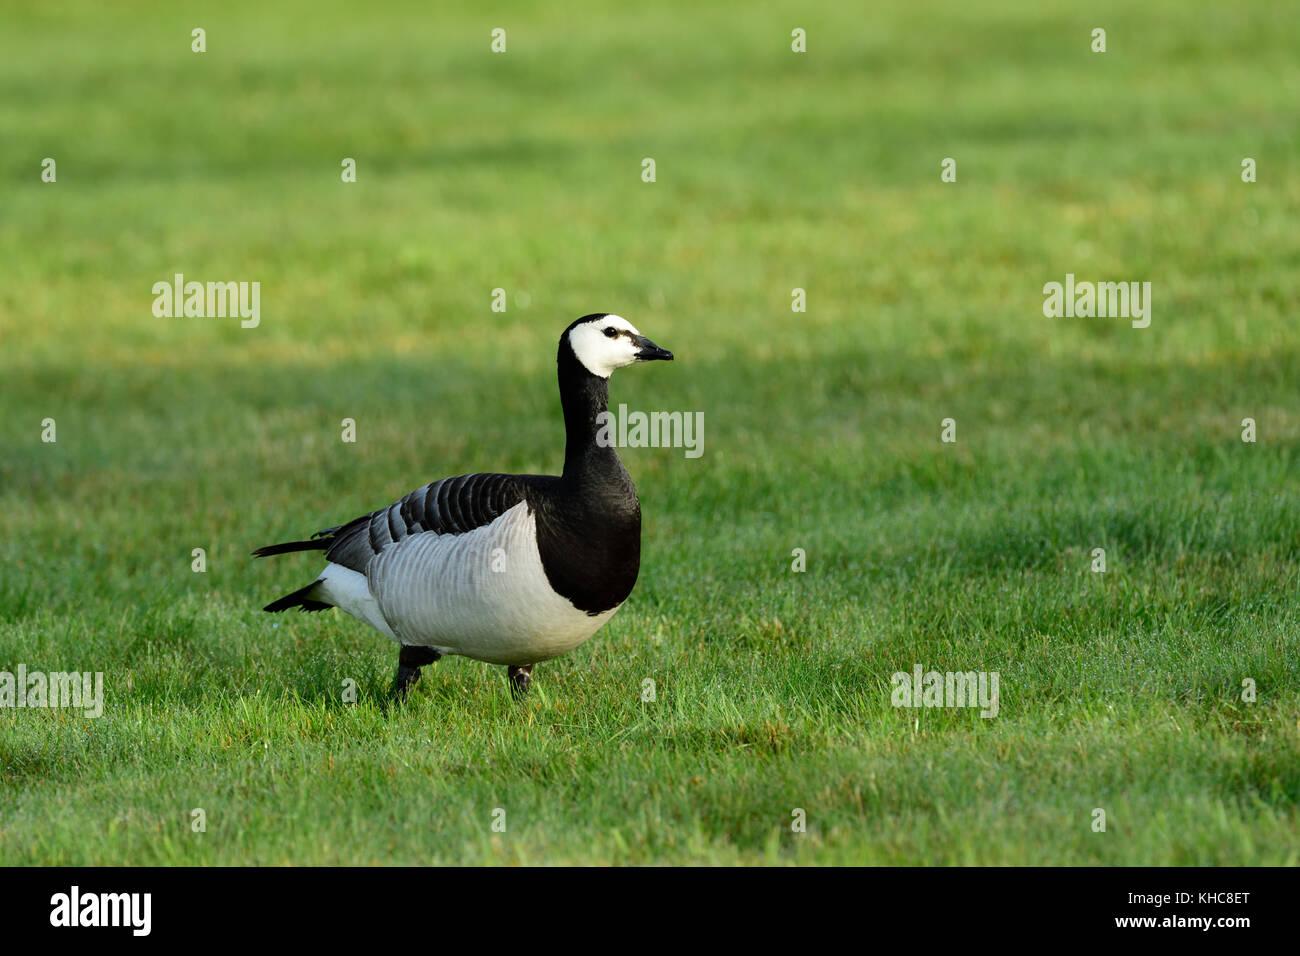 Barnacle goose, Branta leucopsis, Anatidae, adult, goose, bird, animal, Kättbo, Mora kommun, Dalarna county, - Stock Image